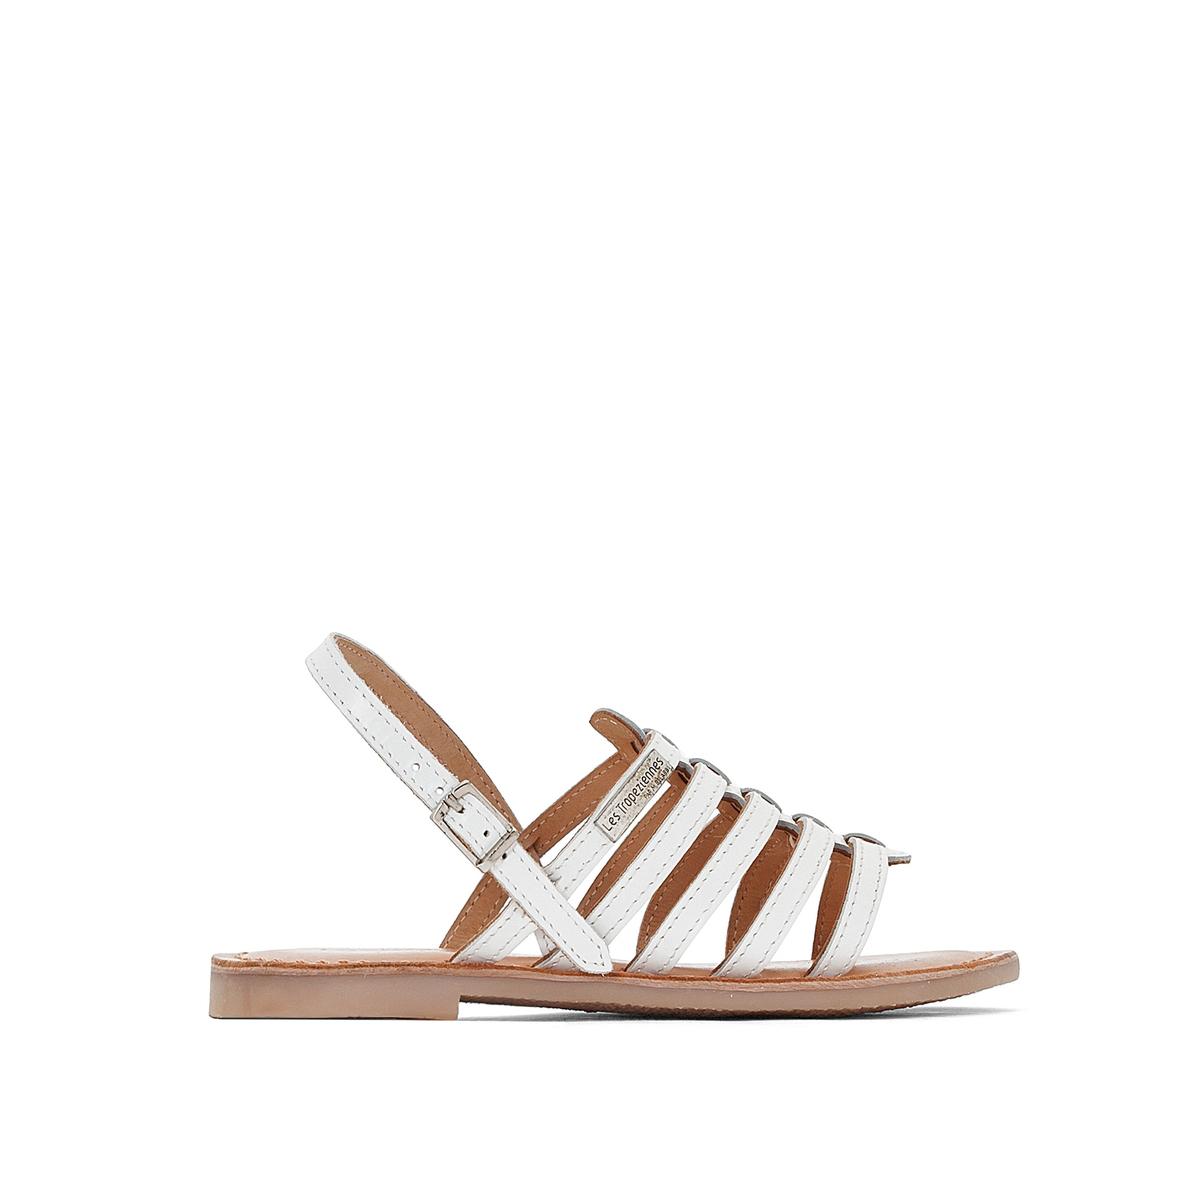 Сандали кожаные на плоской подошве Mangue сандали cristhalia сандали